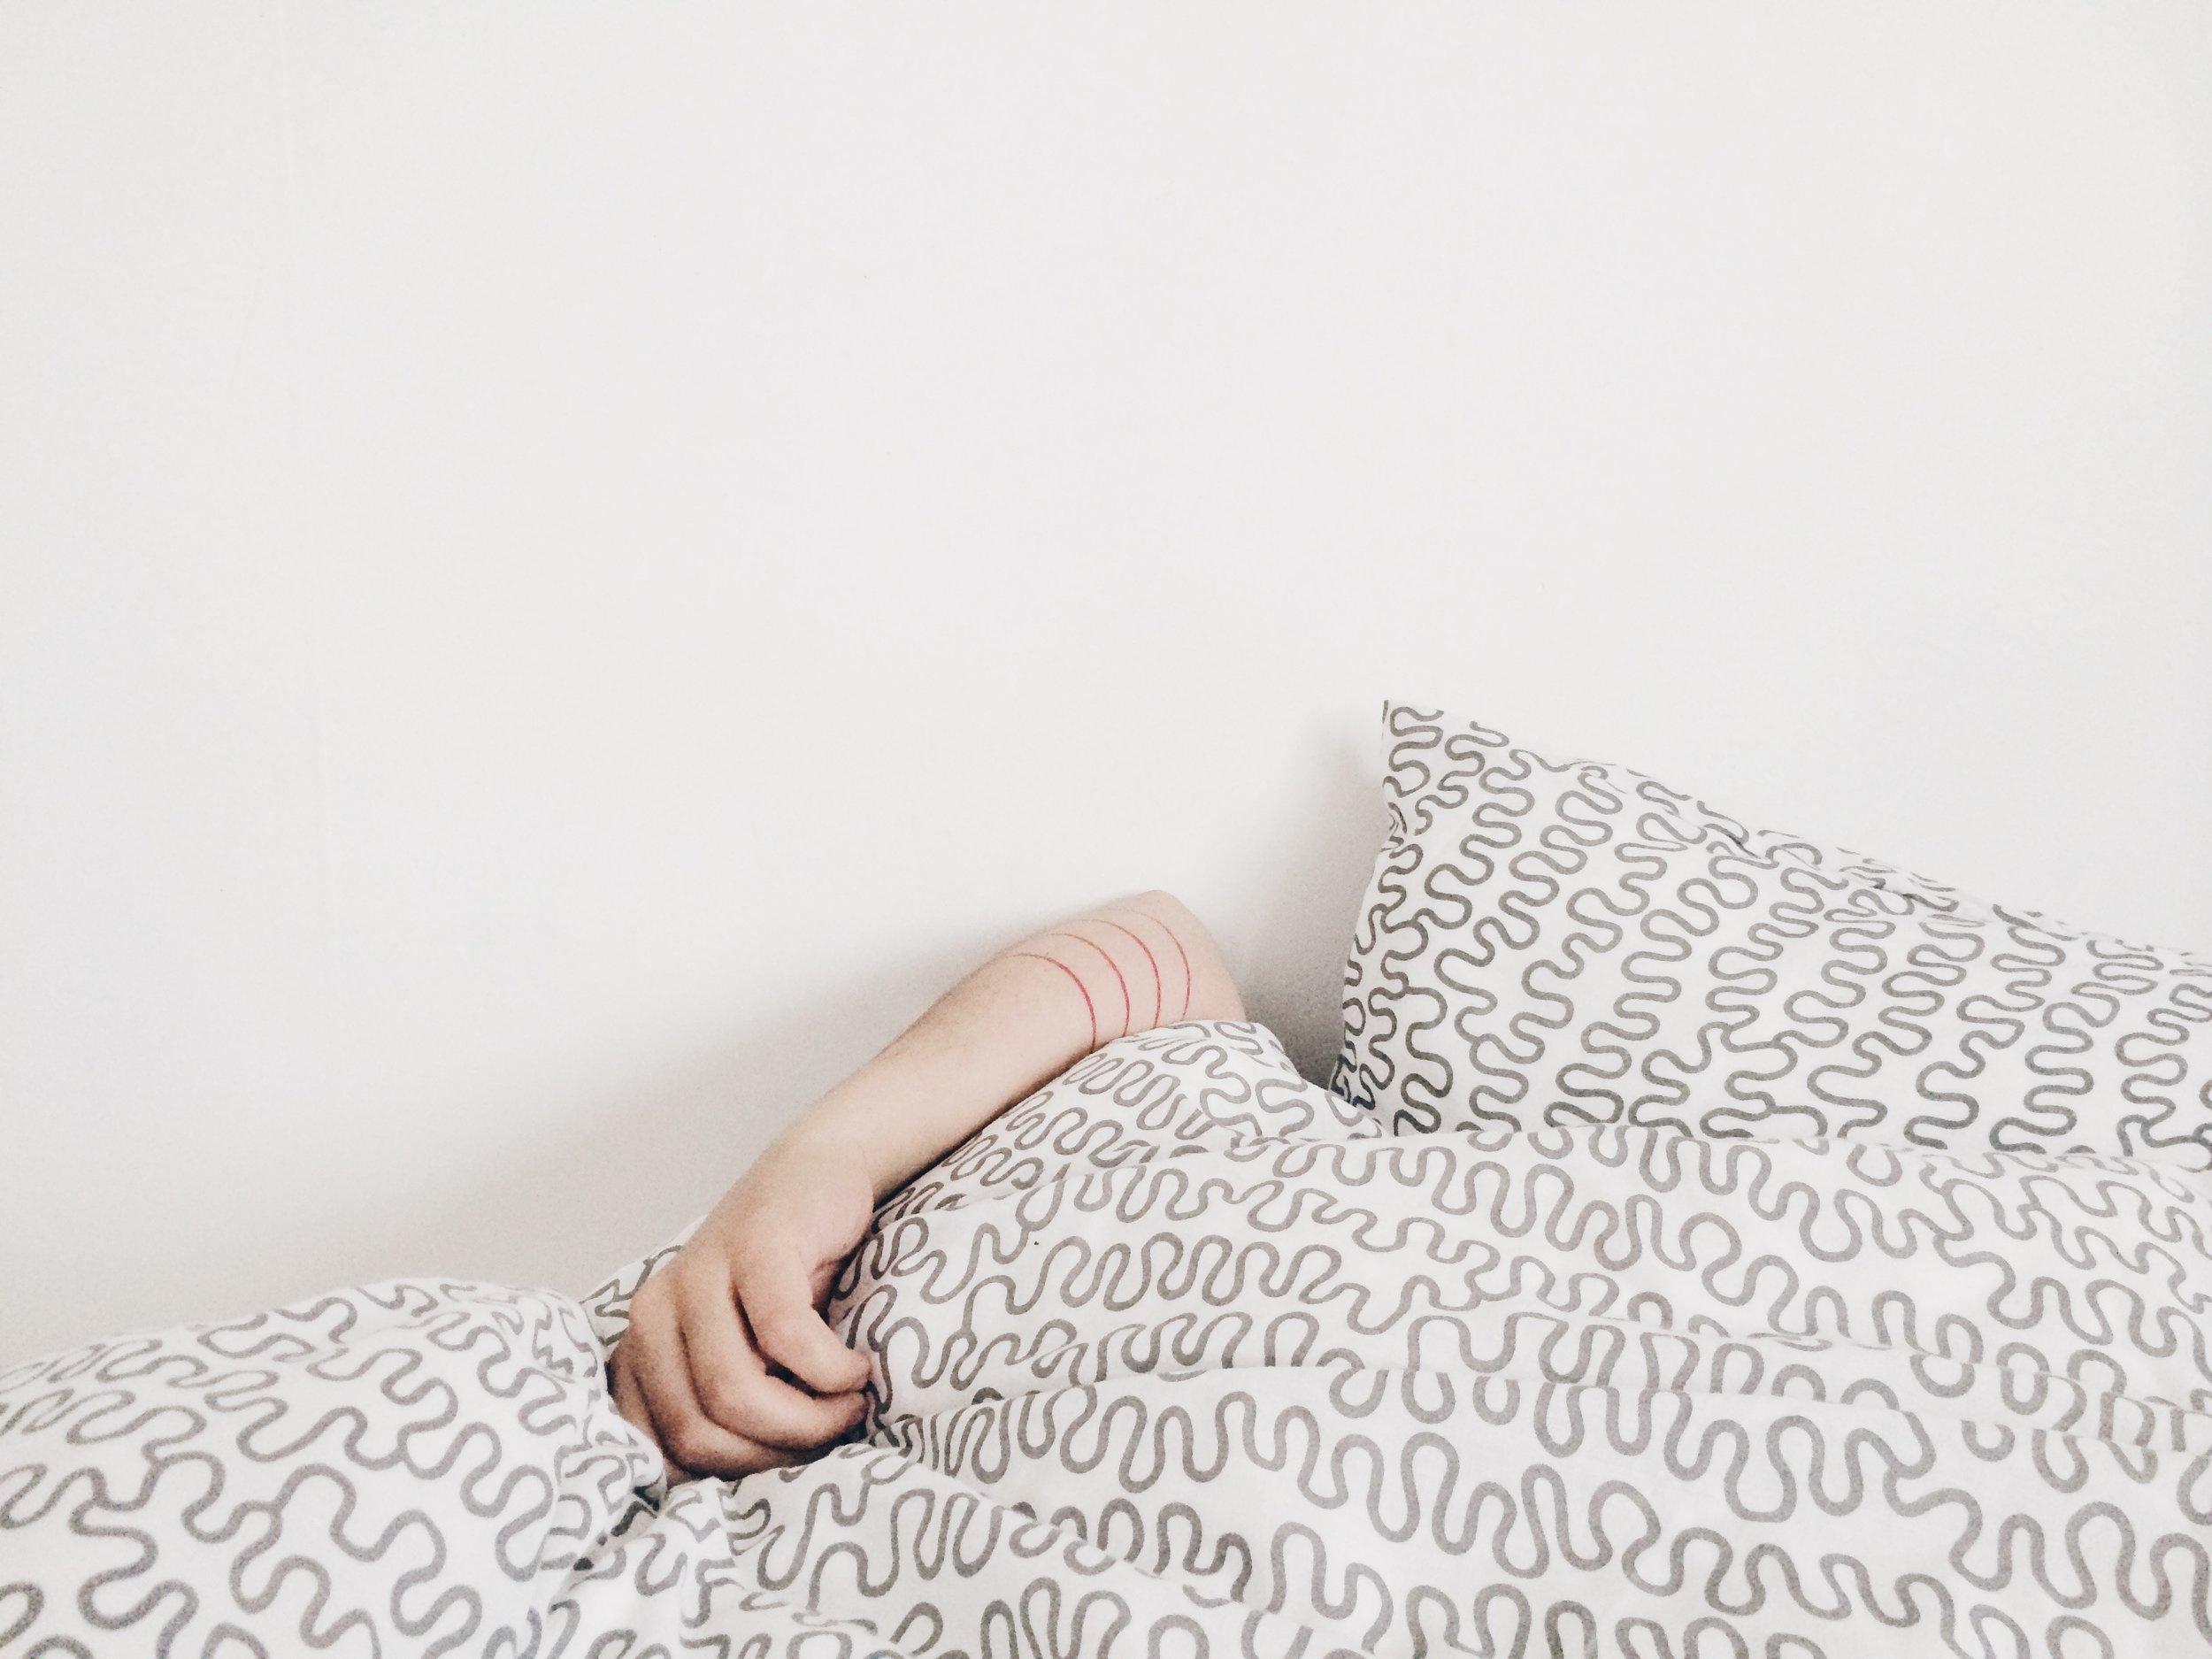 workoutroutine-wintercold-recoveringfromillness.jpg